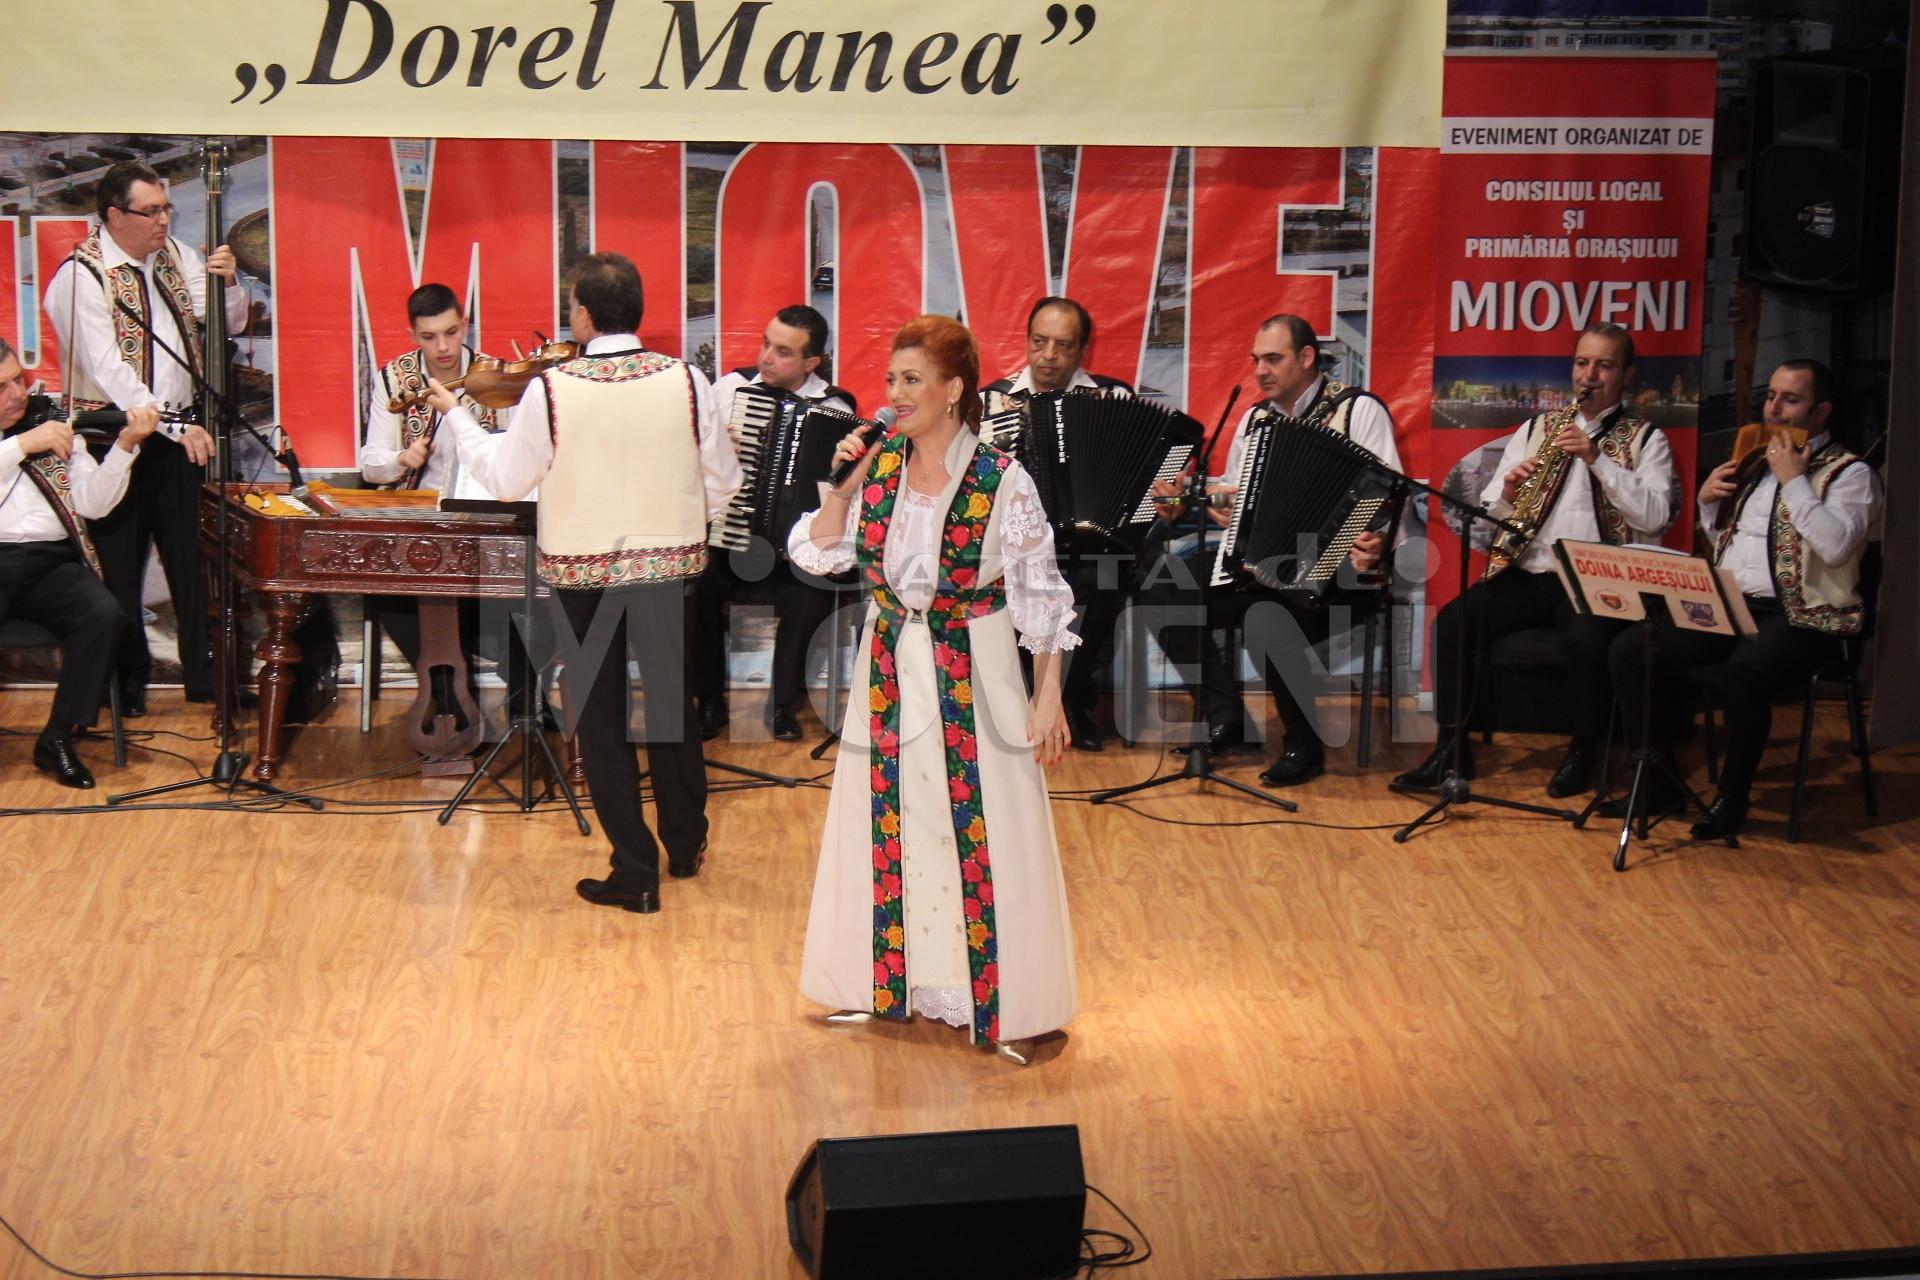 festivalul-dorel-manea-mioveni-2016-3